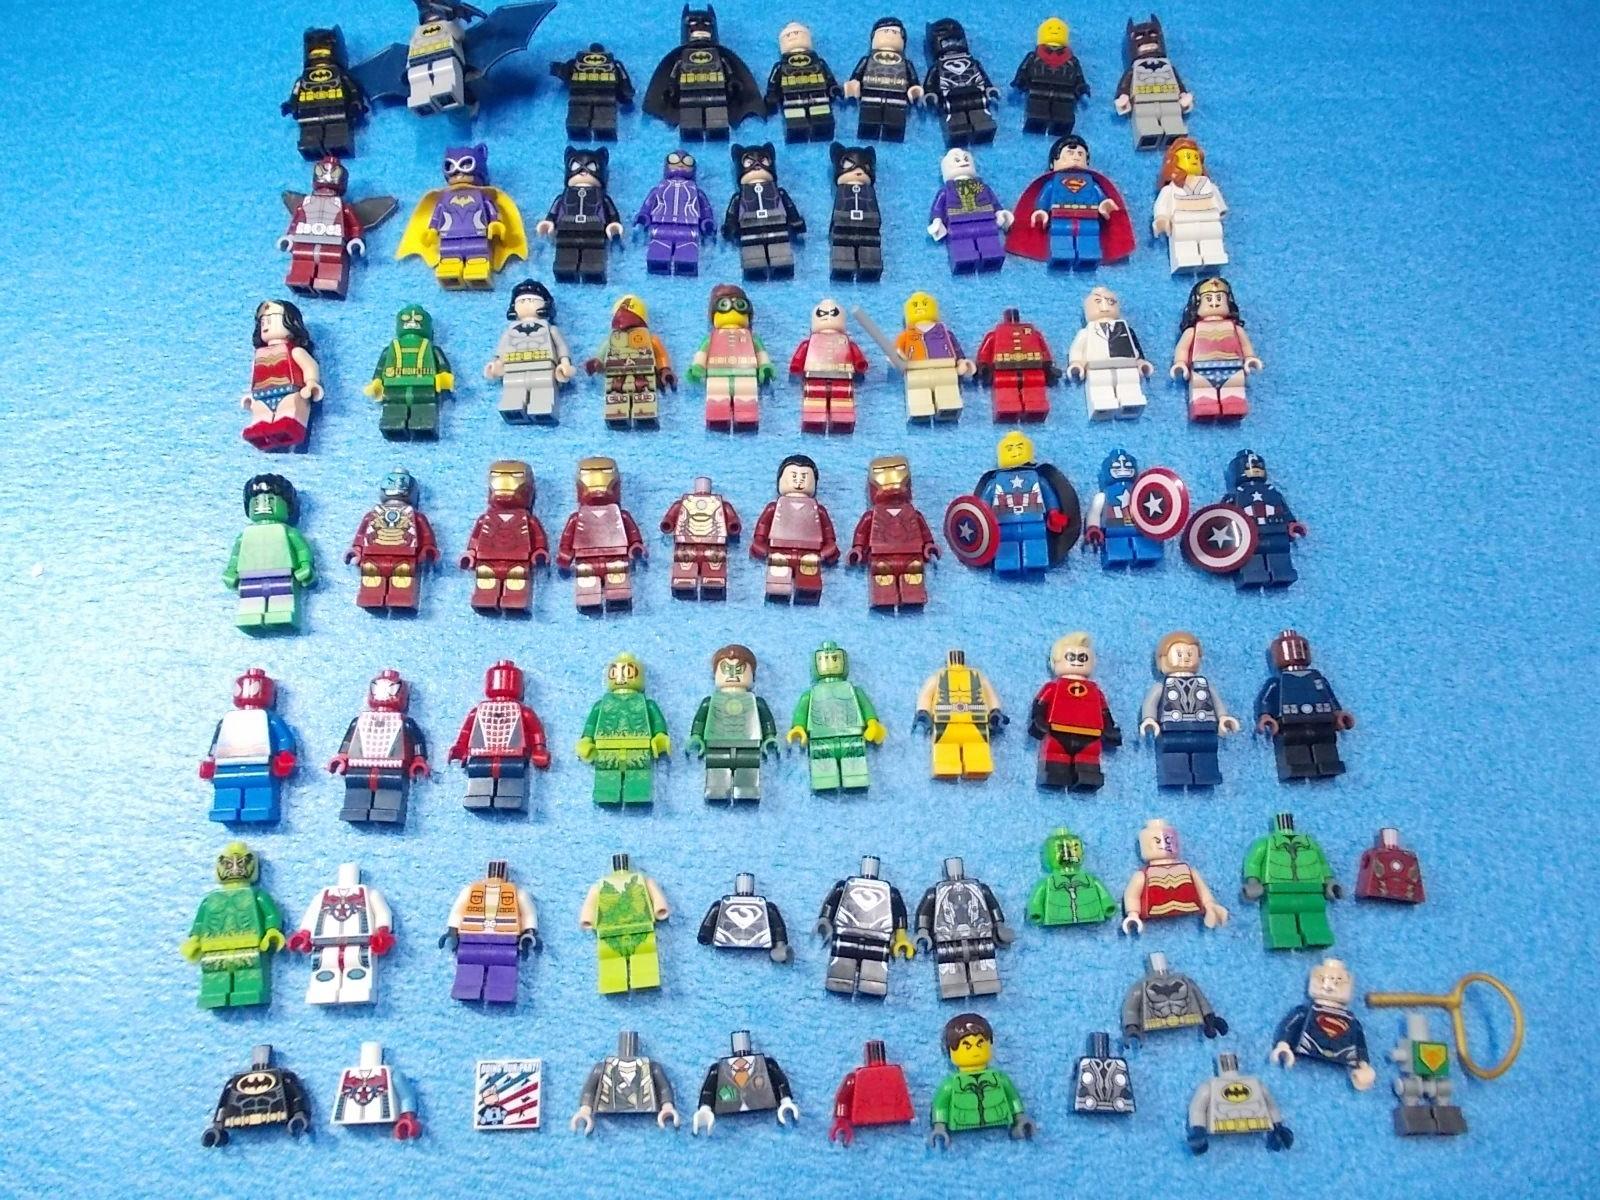 Ogromny Zestaw Figurek Lego Marvel Super Heros 7429139883